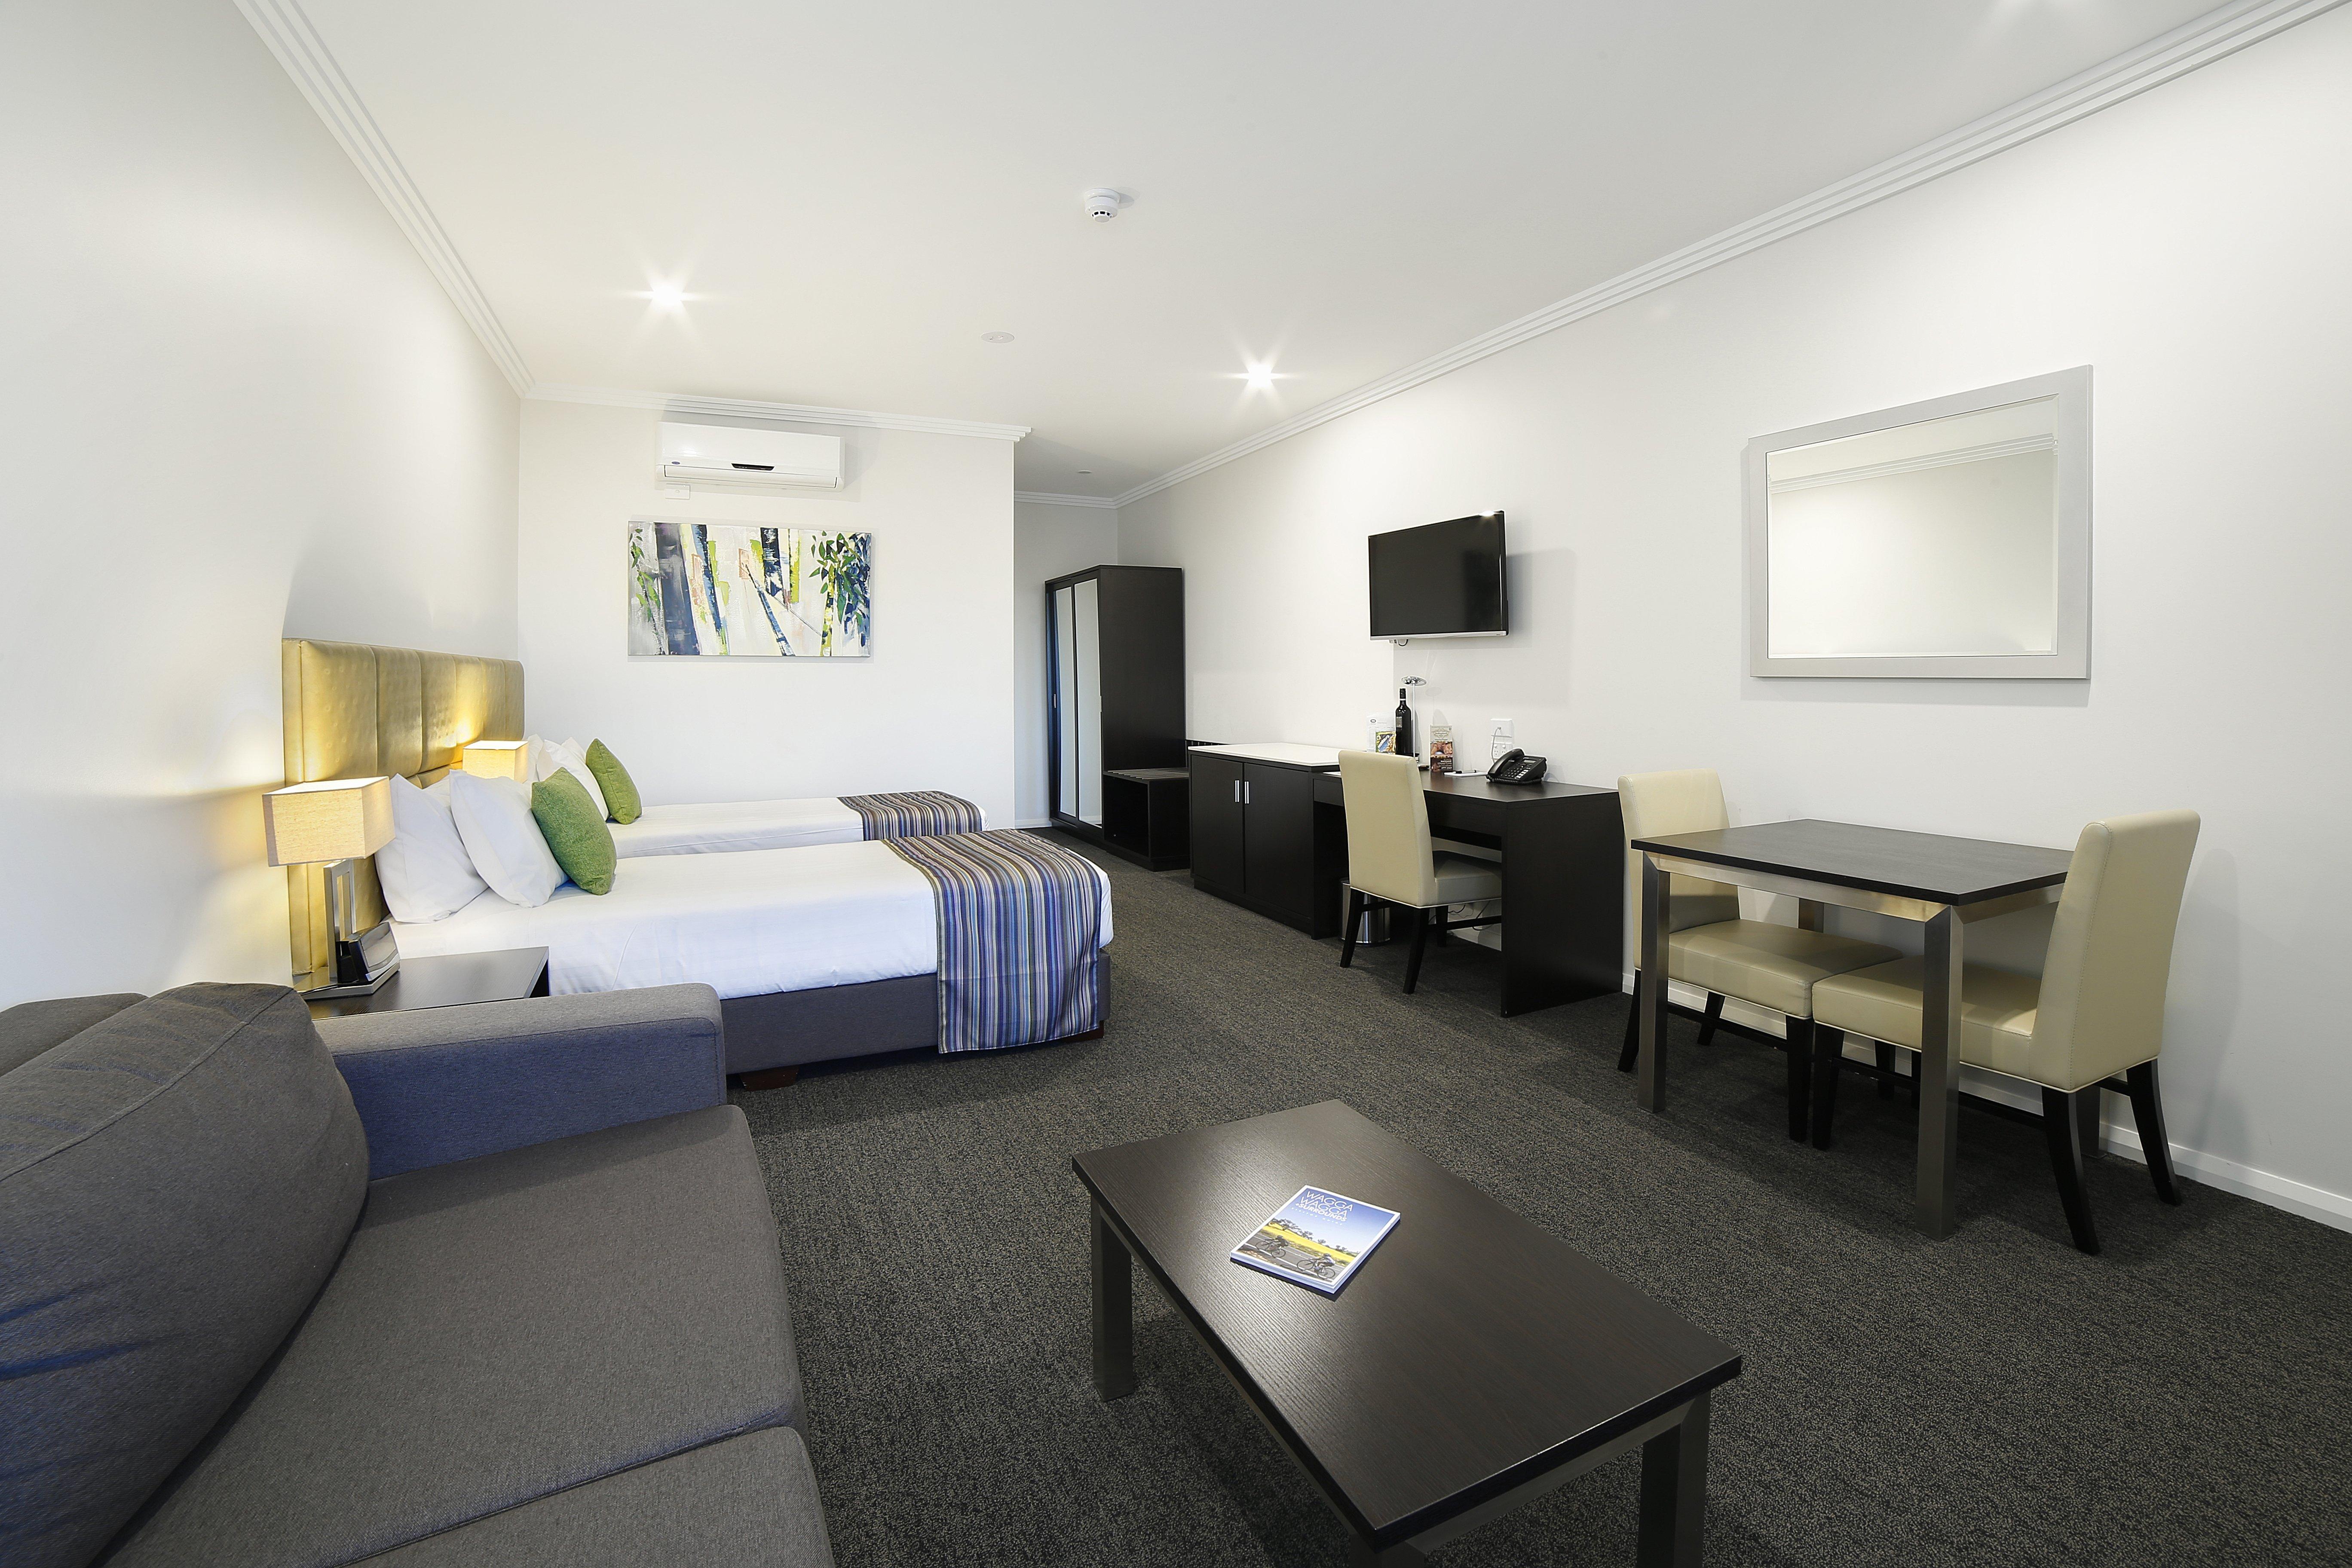 Hotel Accommodation, Wagga Wagga, NSW